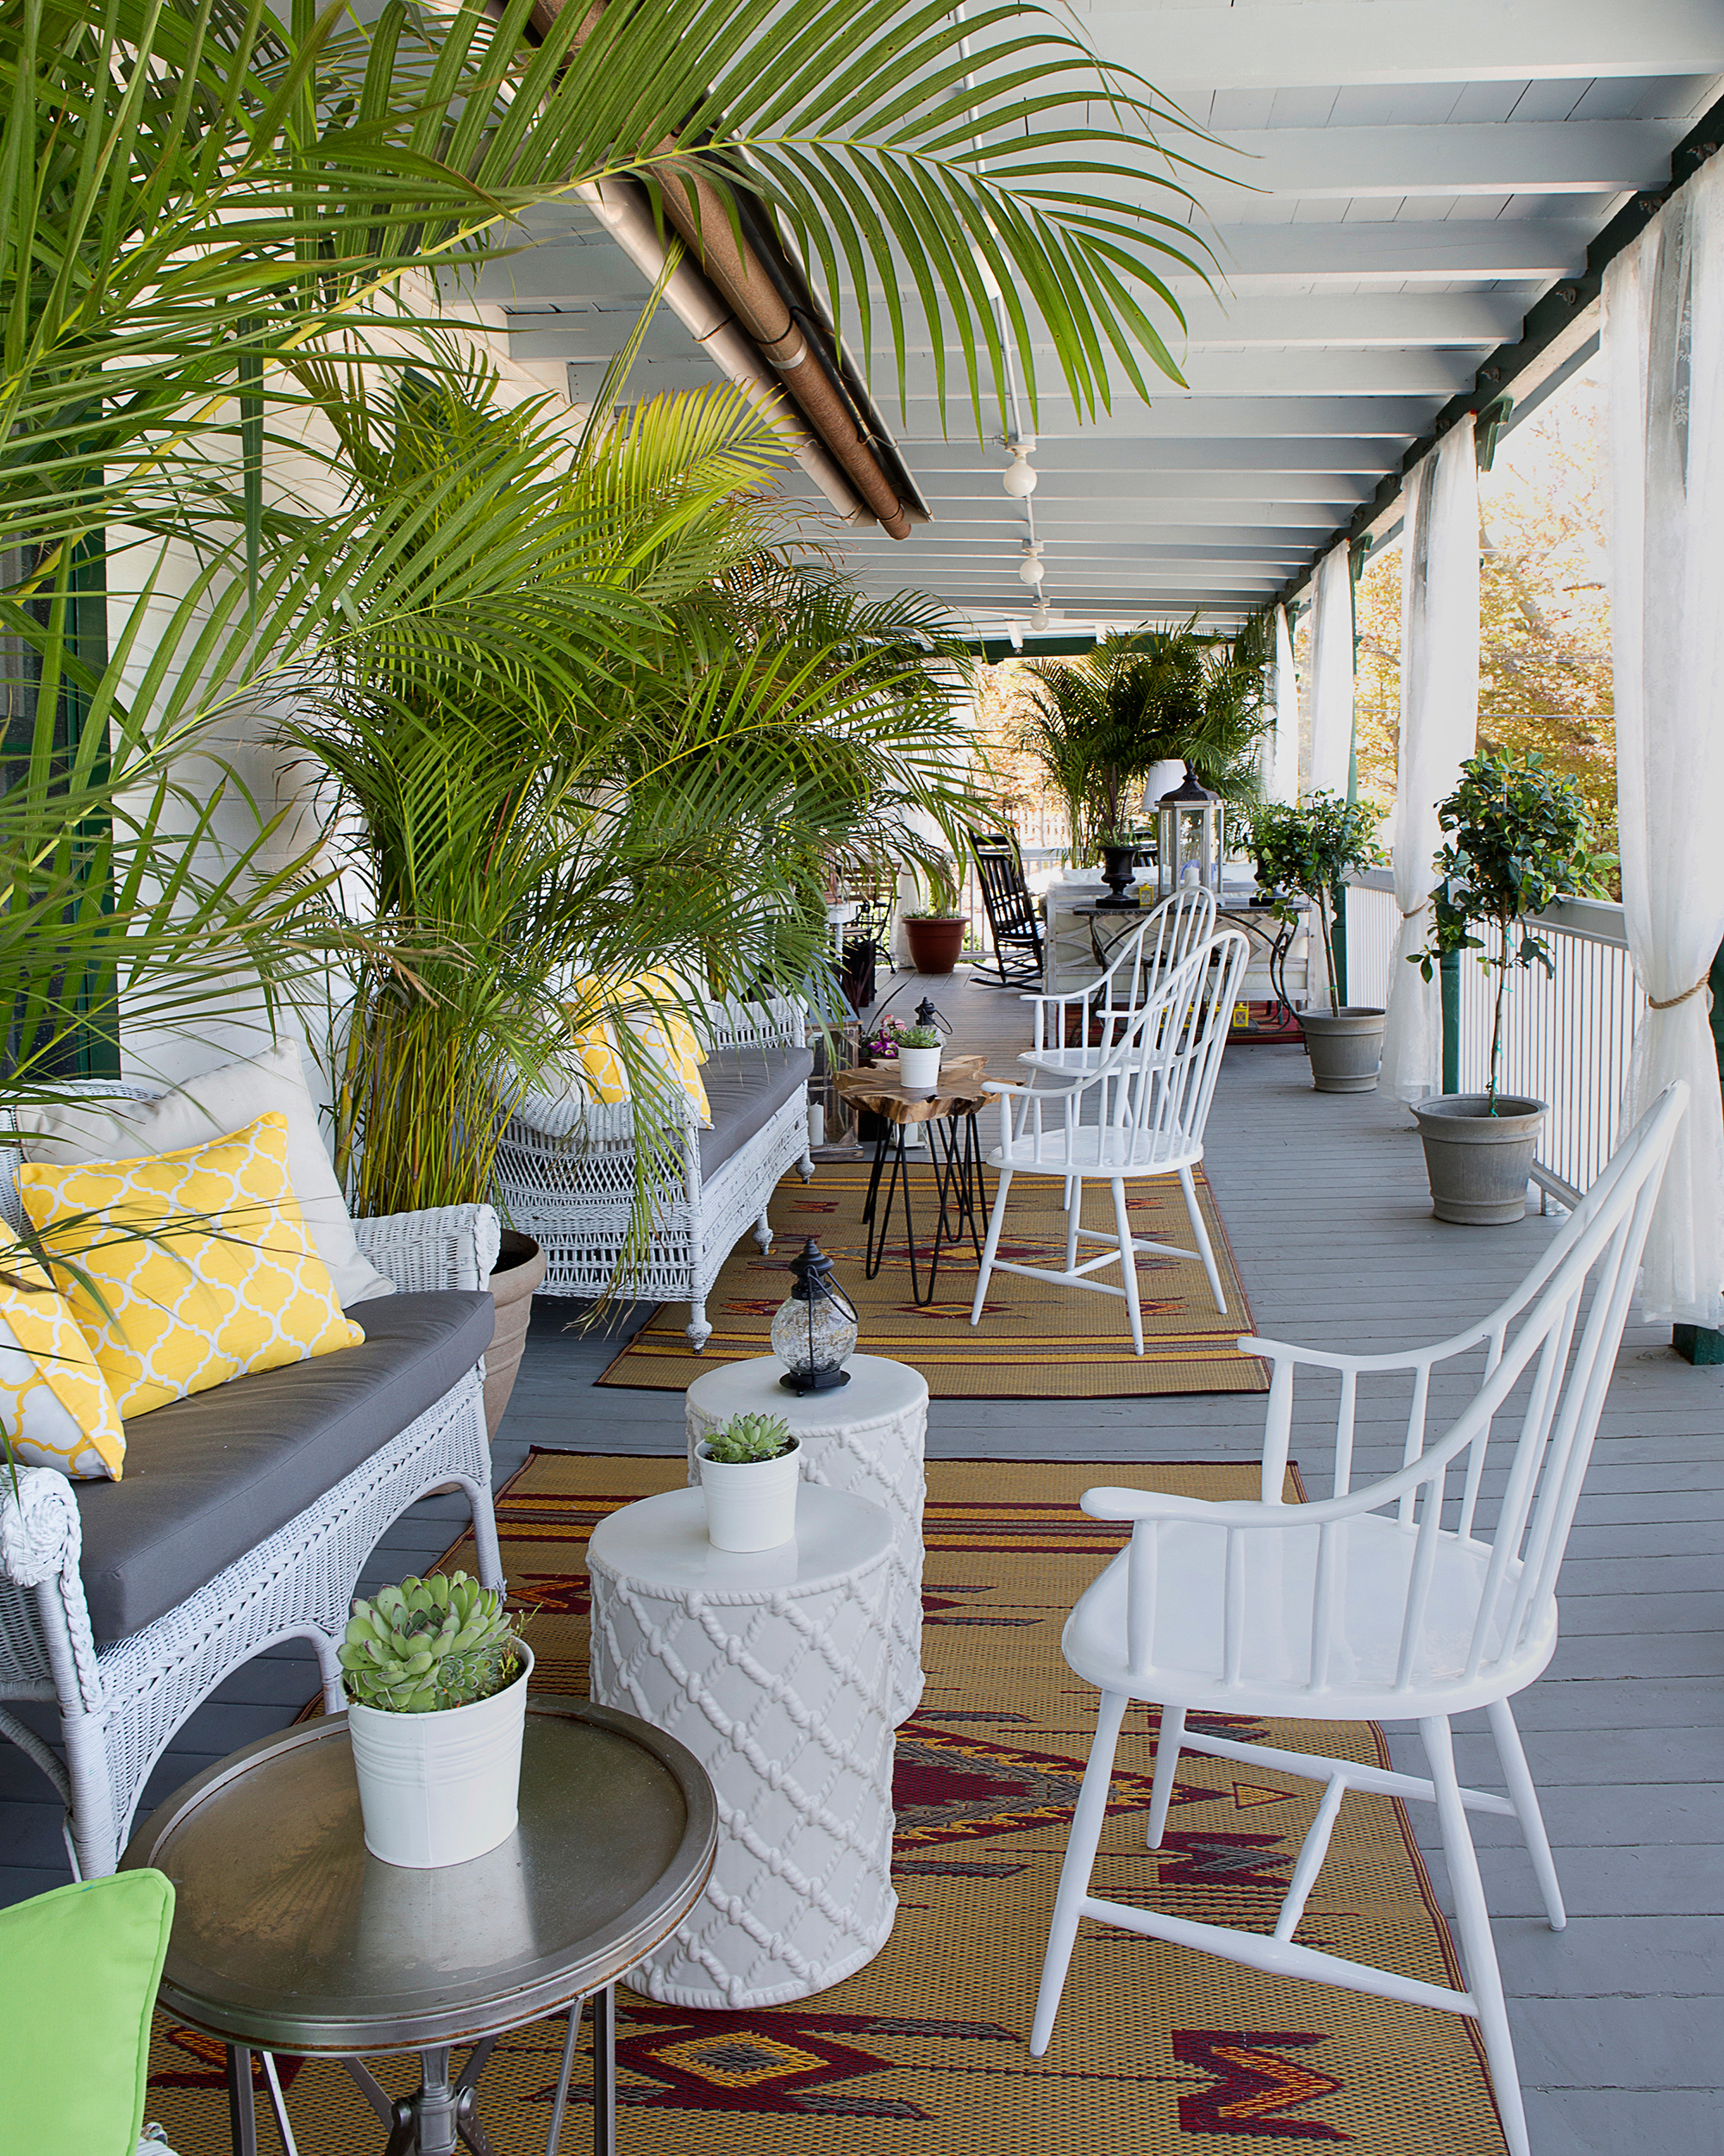 us-islands-shelter-island-chequit-hotel-porch-1115.jpg